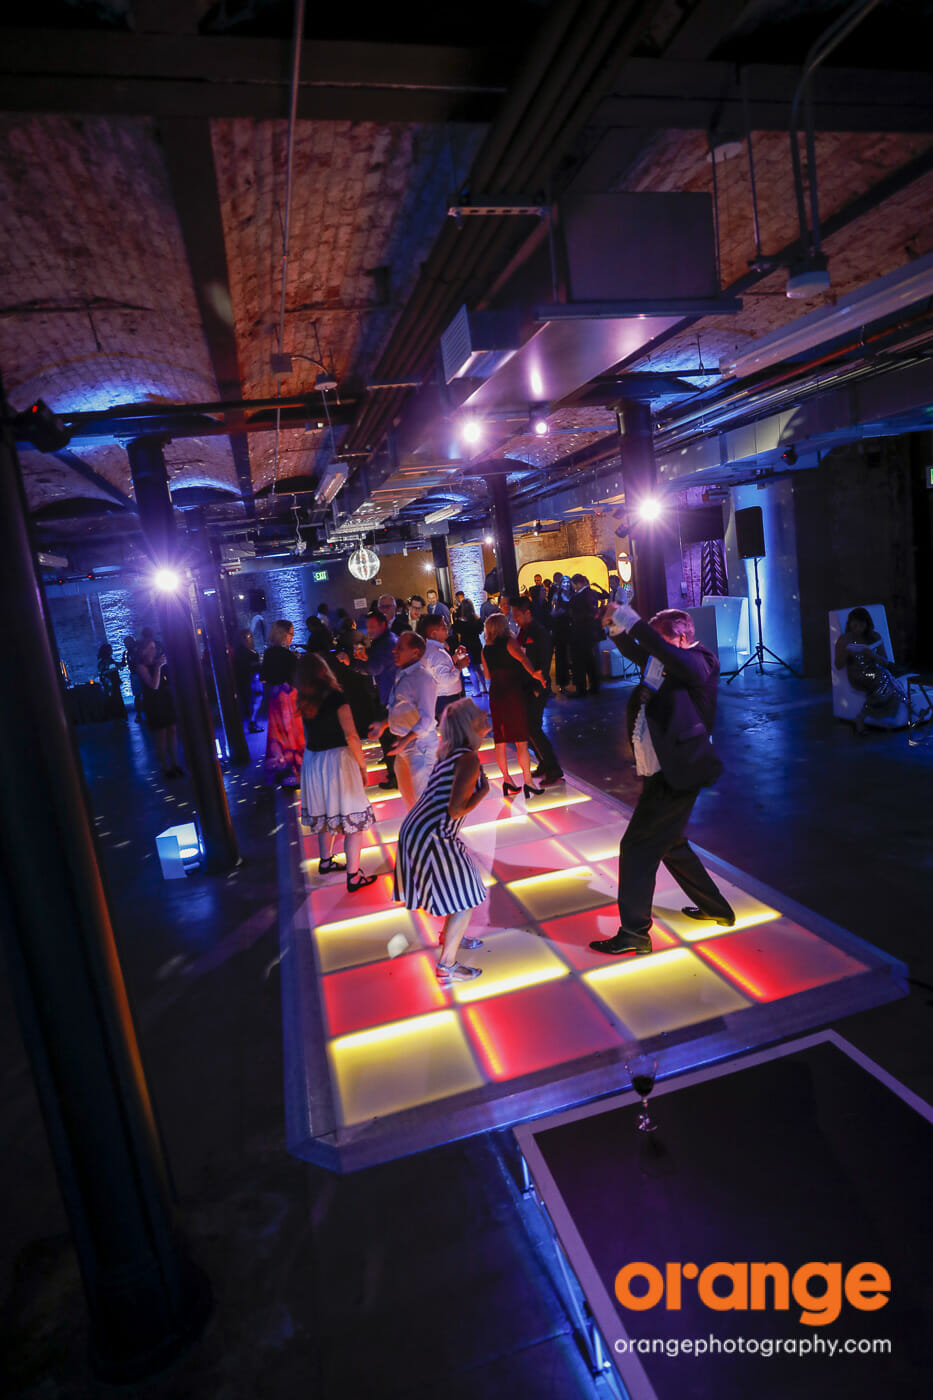 2019 MPINCC Gala at the Hibernia! Lighted Dance Floor!